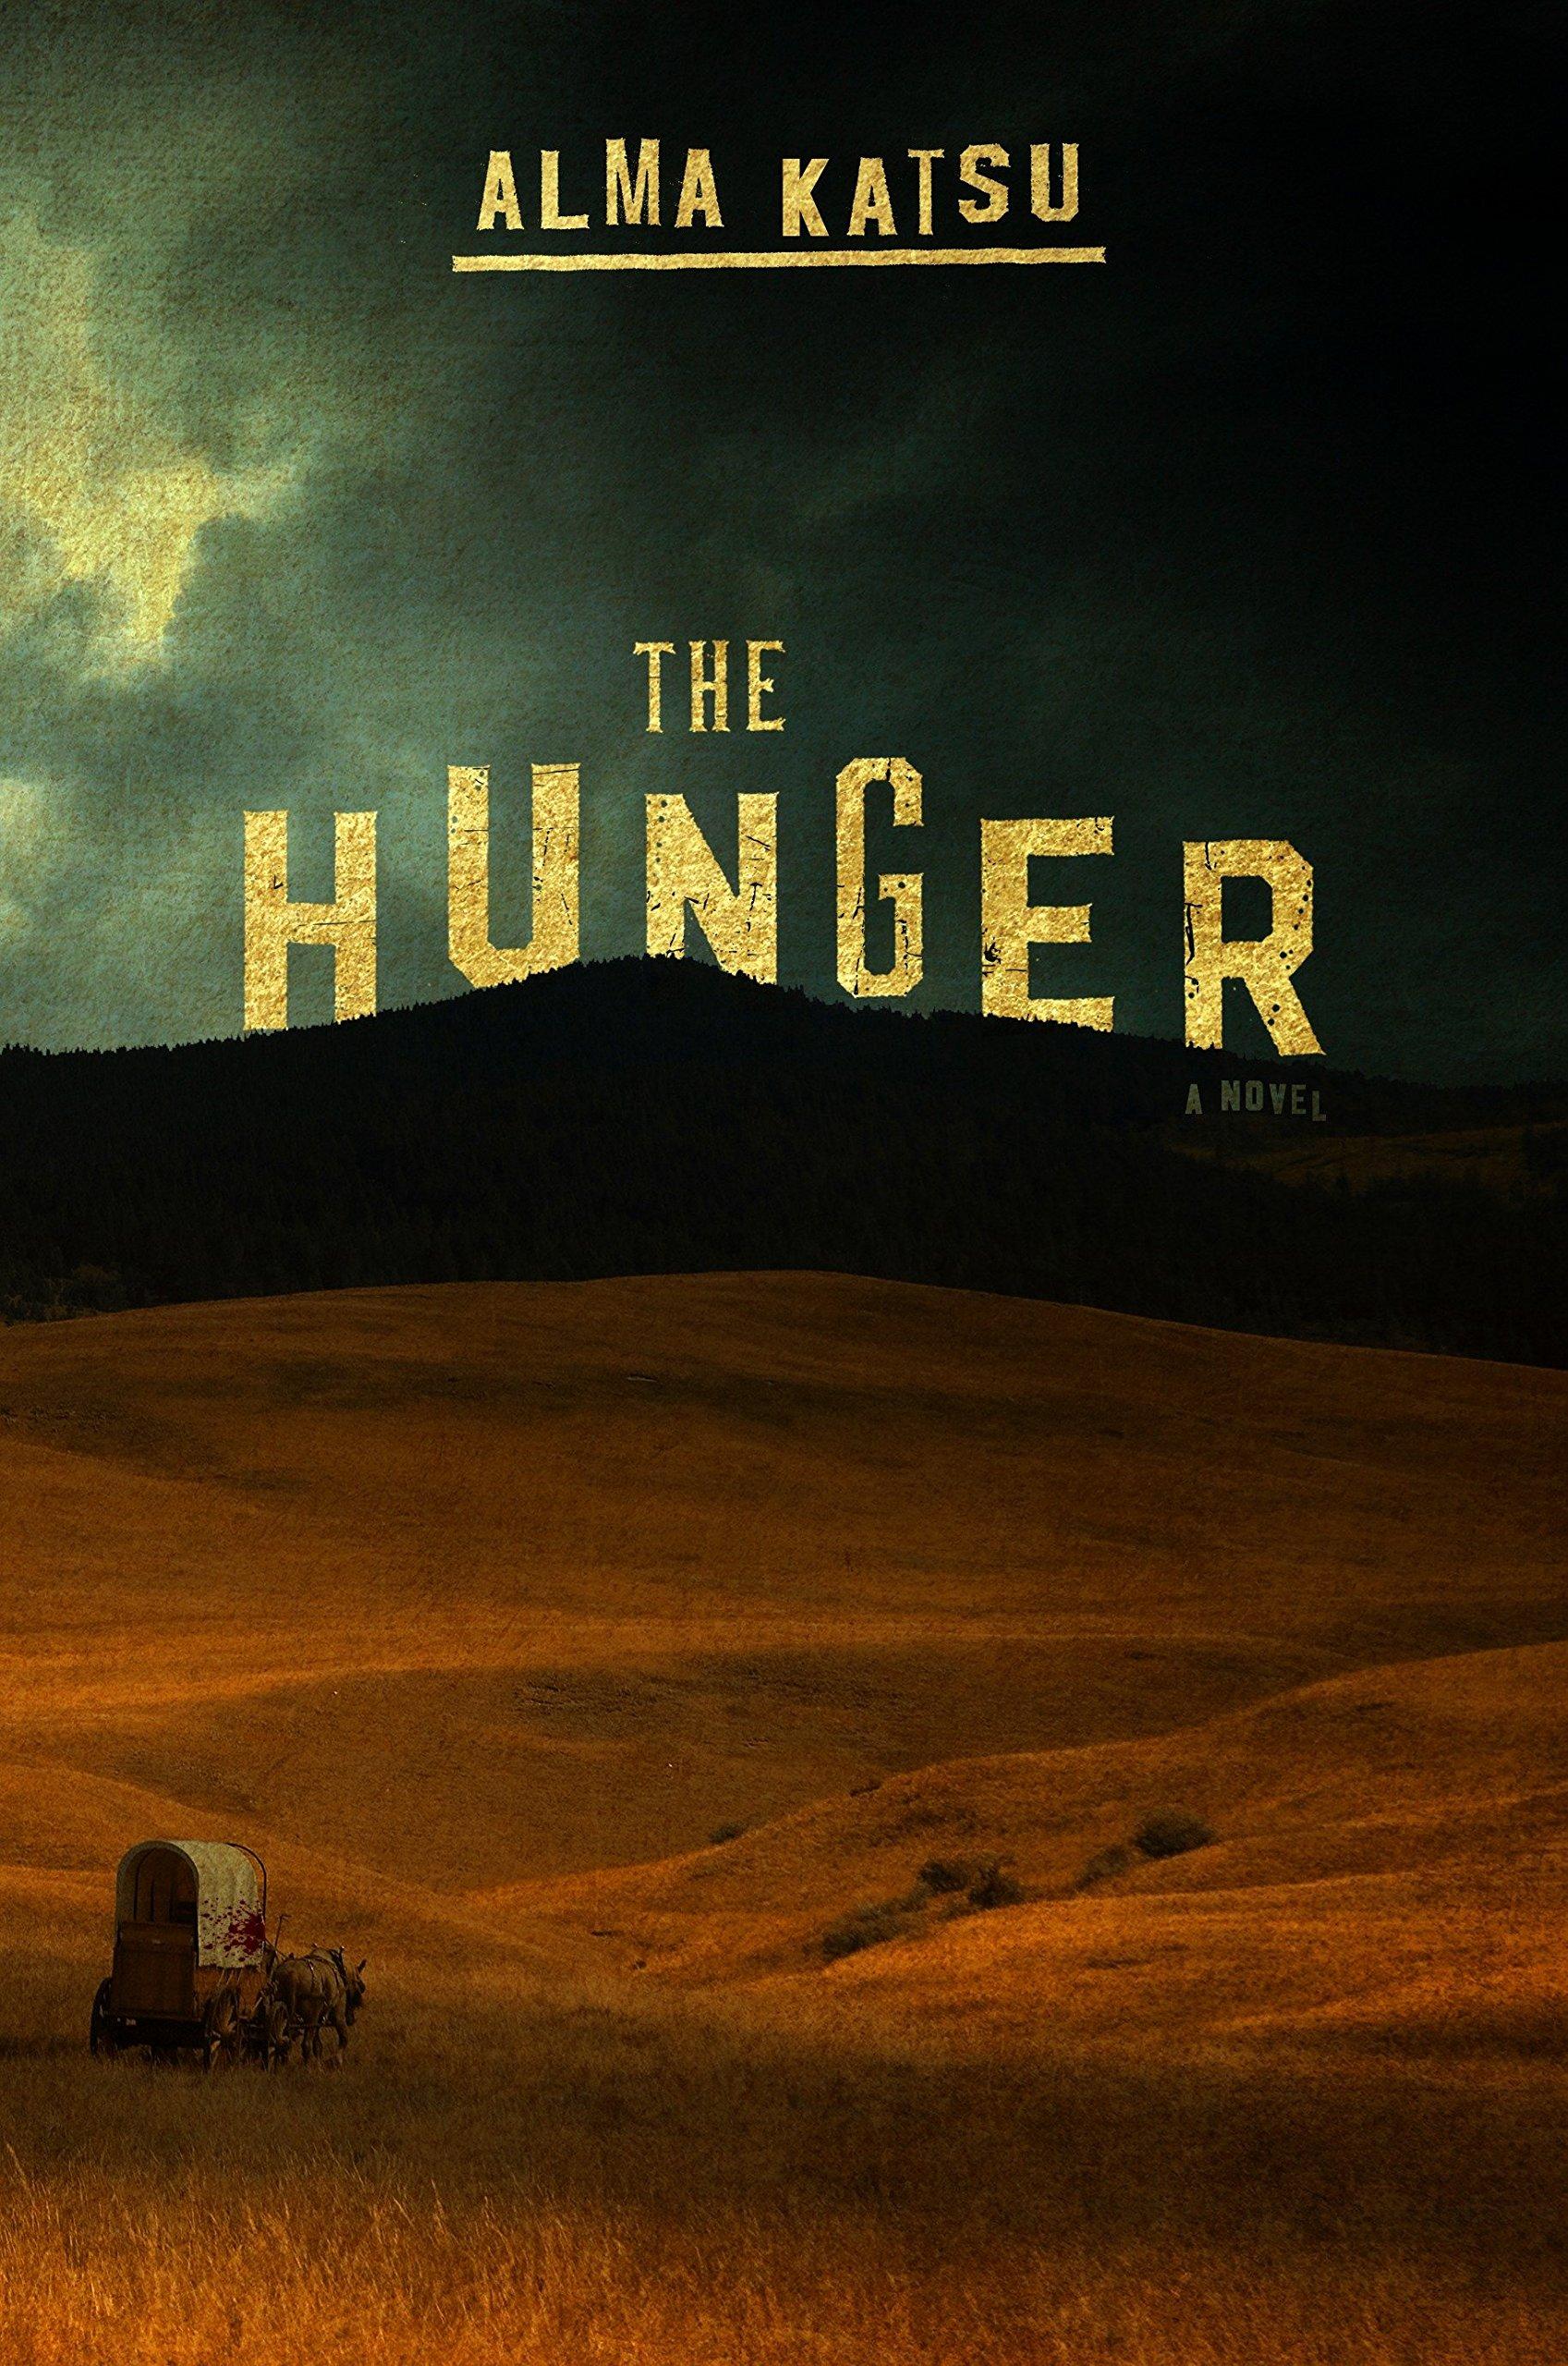 Amazon.com: The Hunger (9780735212510): Katsu, Alma: Books